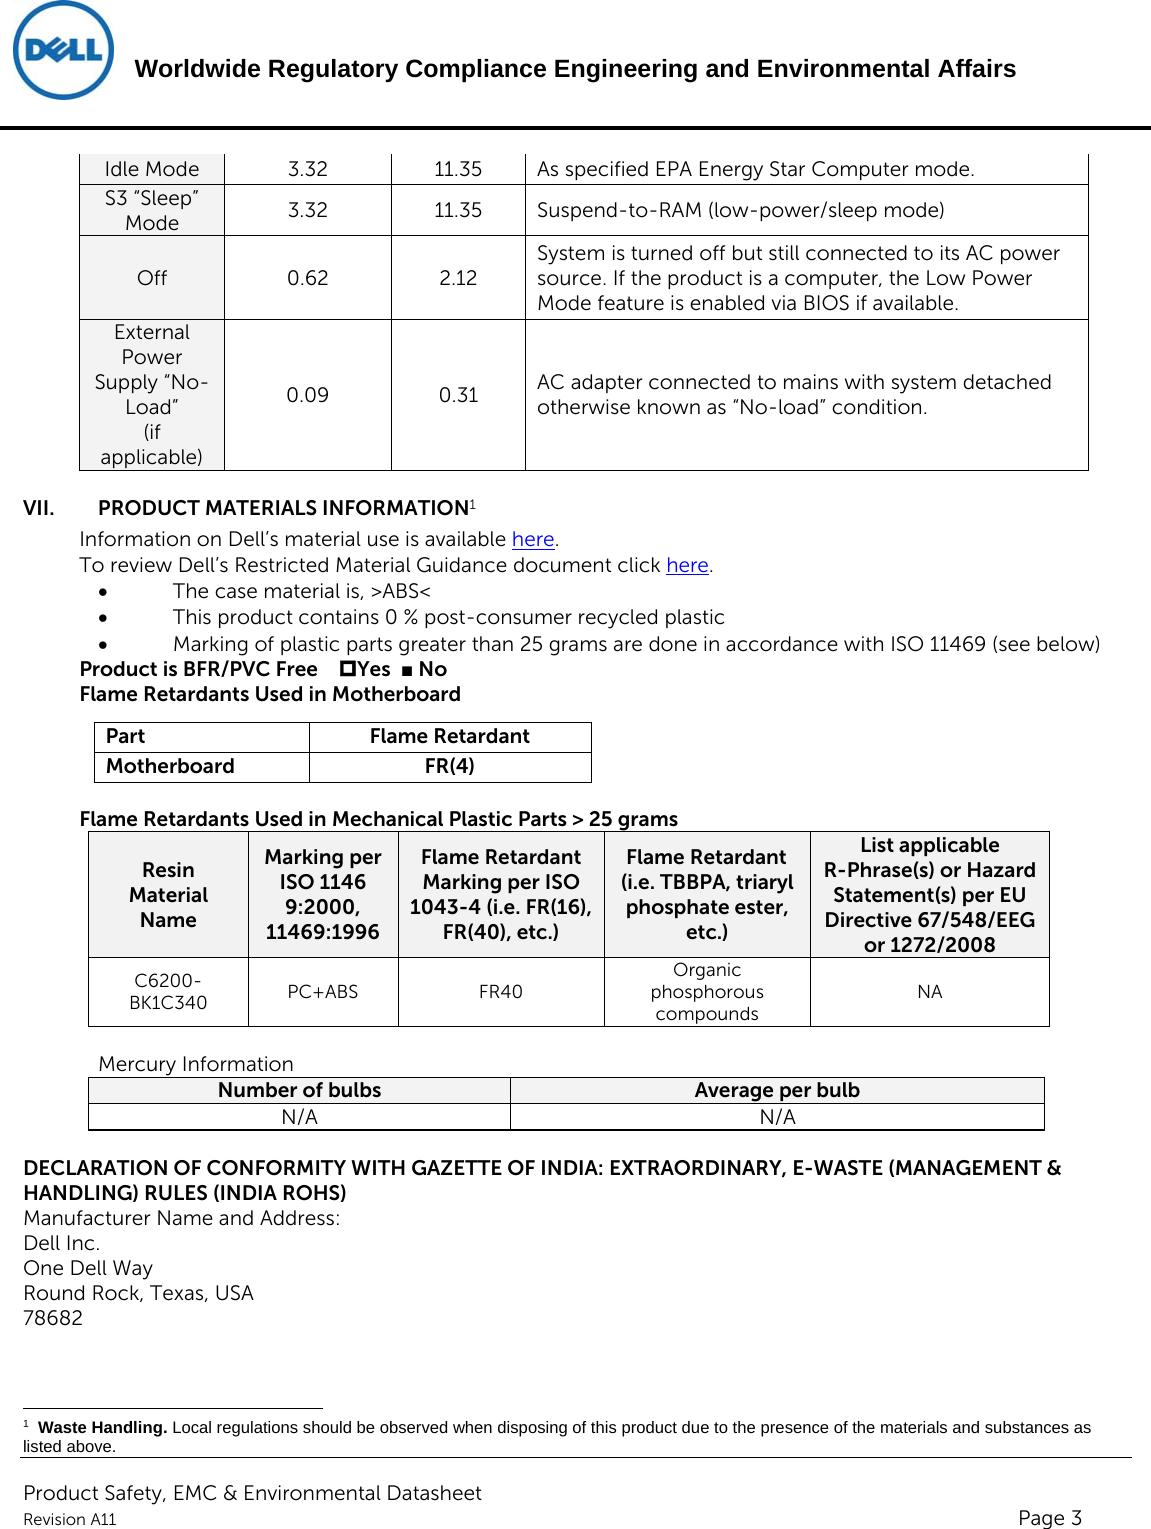 Dell Wyse 3040 thin client ENV0023_ENV_Datasheet_N10D User